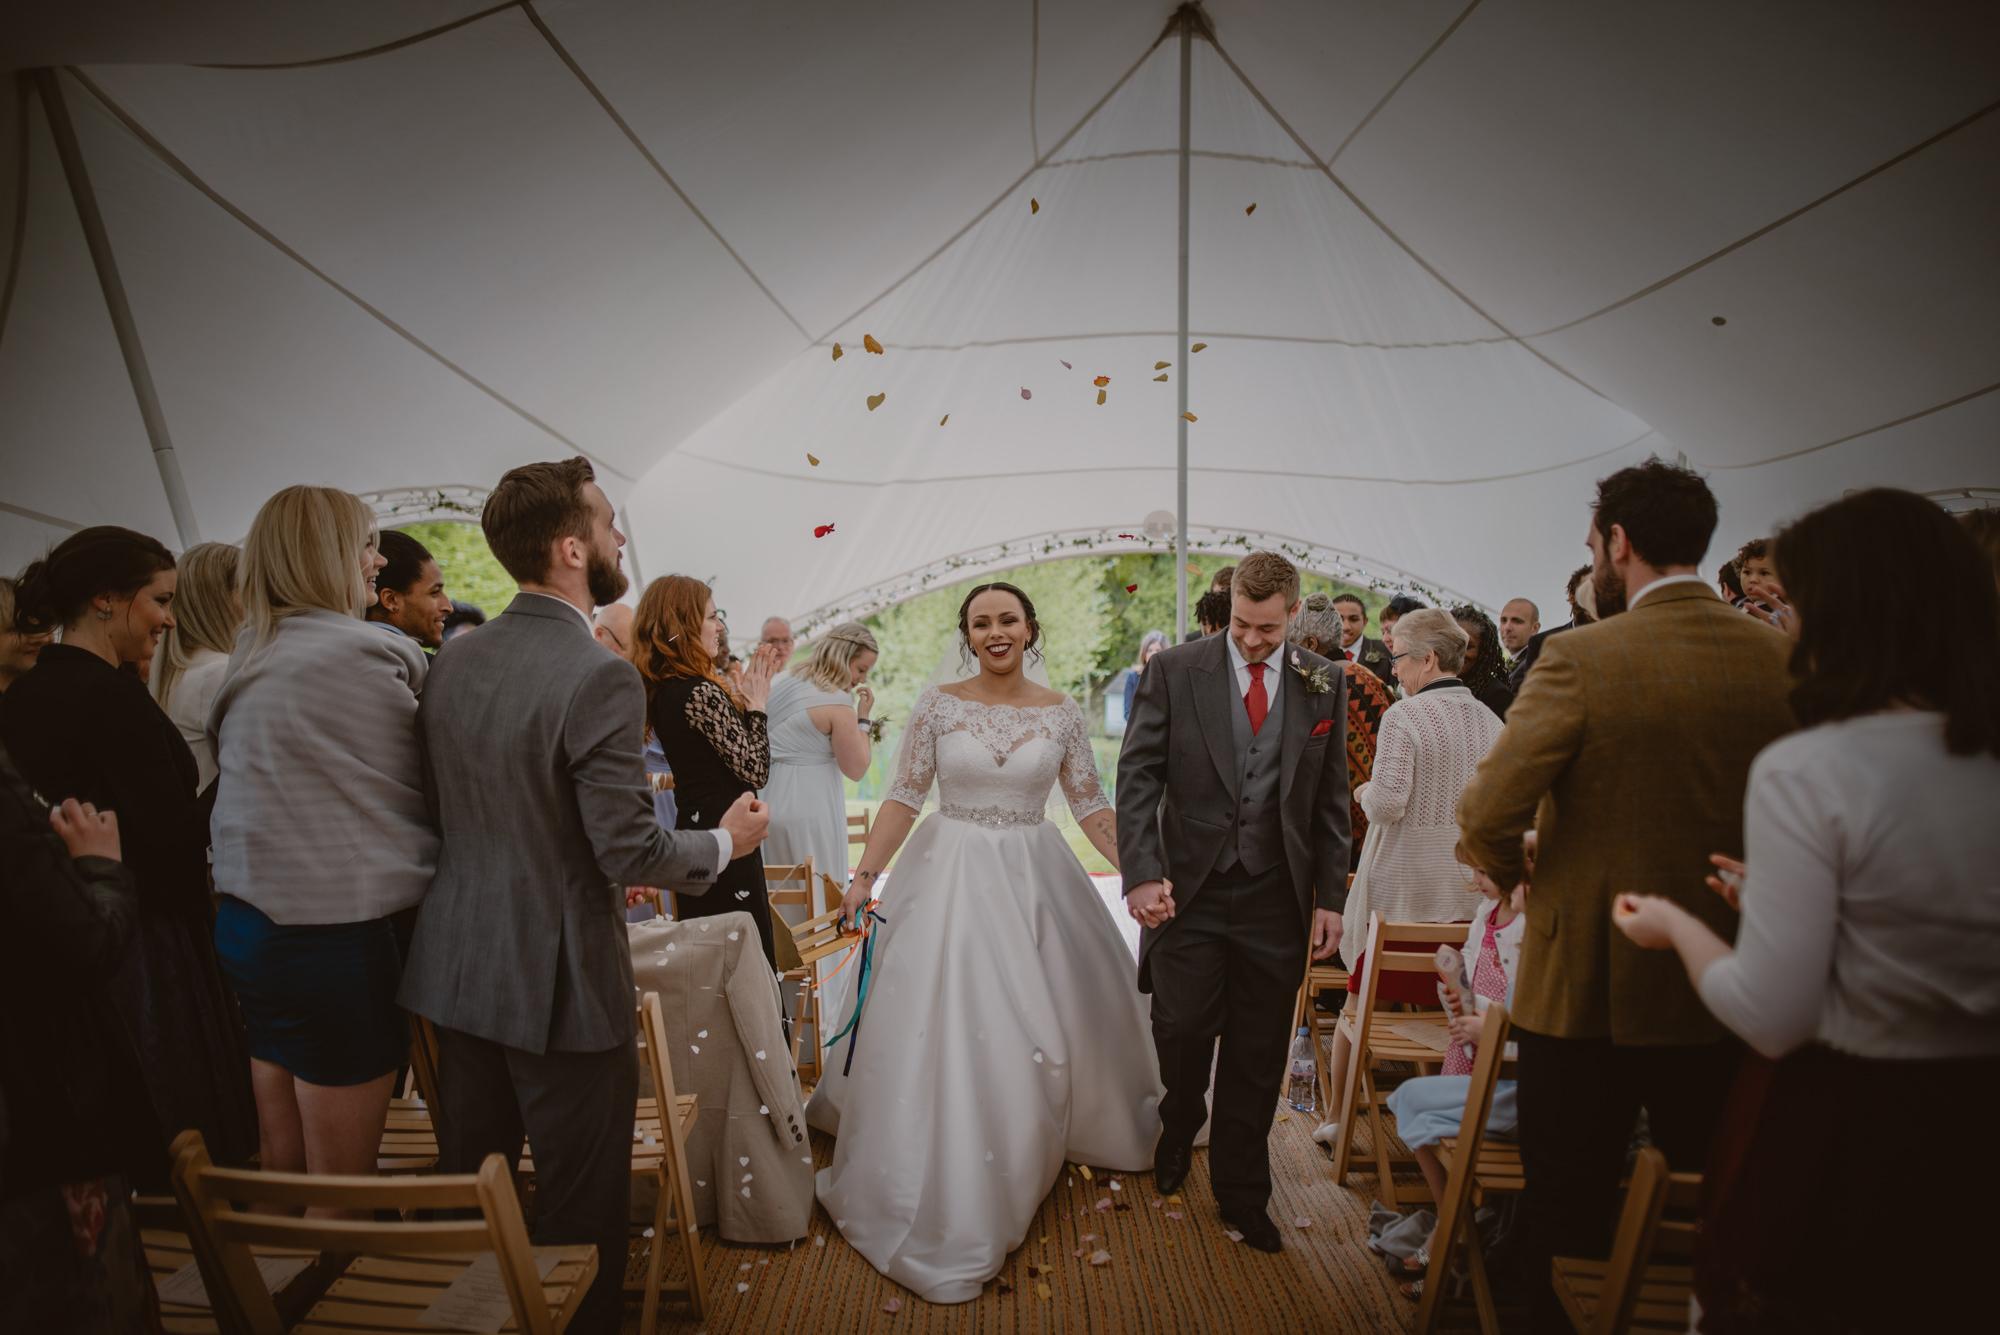 Jacqueline-Gareth-Wedding-Westmead-Events-Surrey-Manu-Mendoza-Wedding-Photography-276.jpg